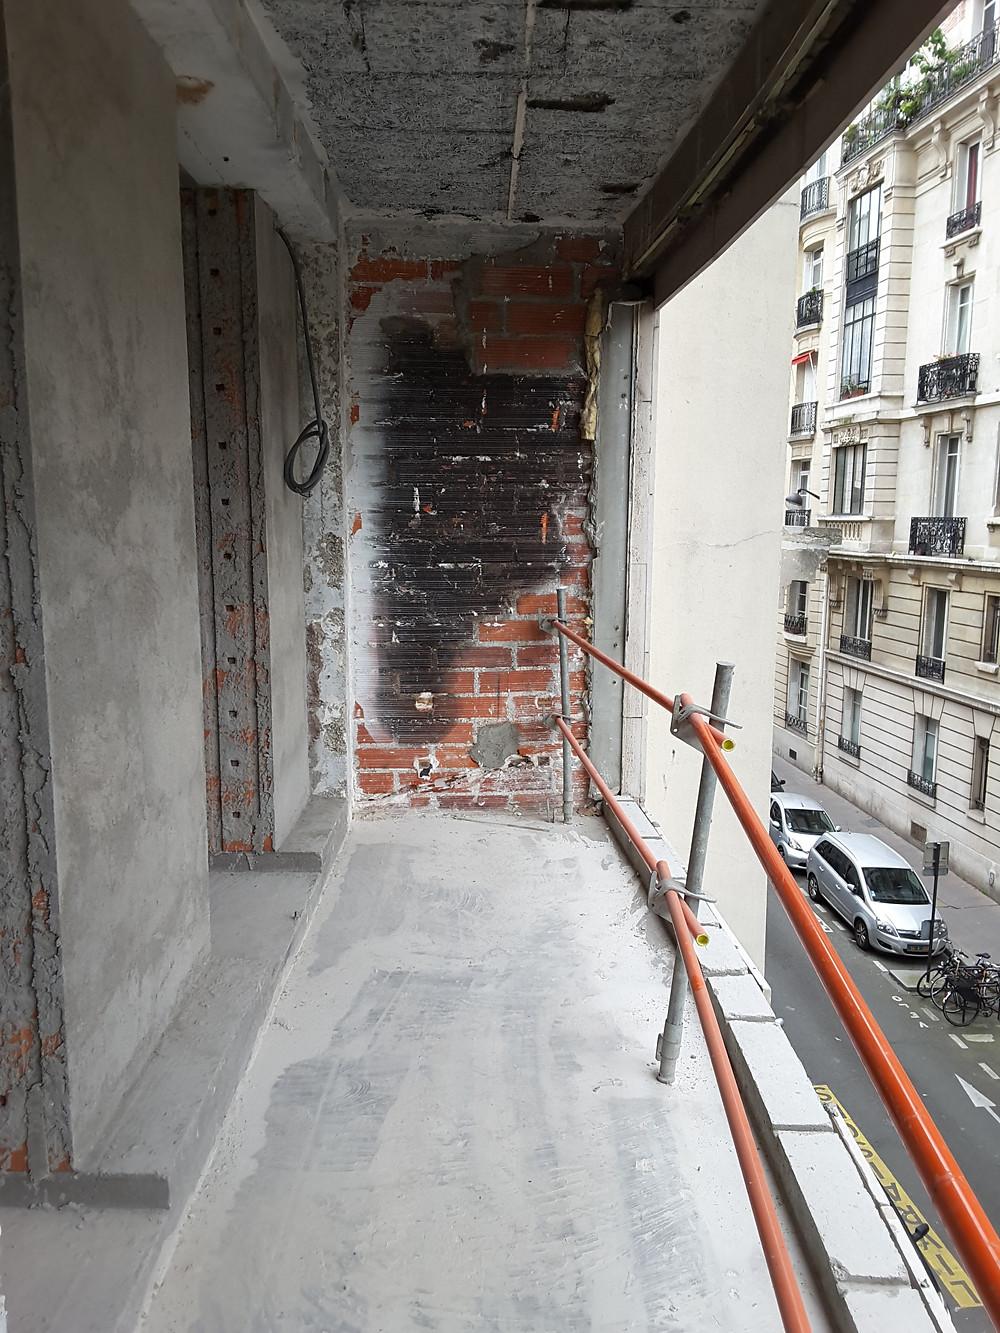 New balcony waiting for windows, cladding, floor treatment and railings.